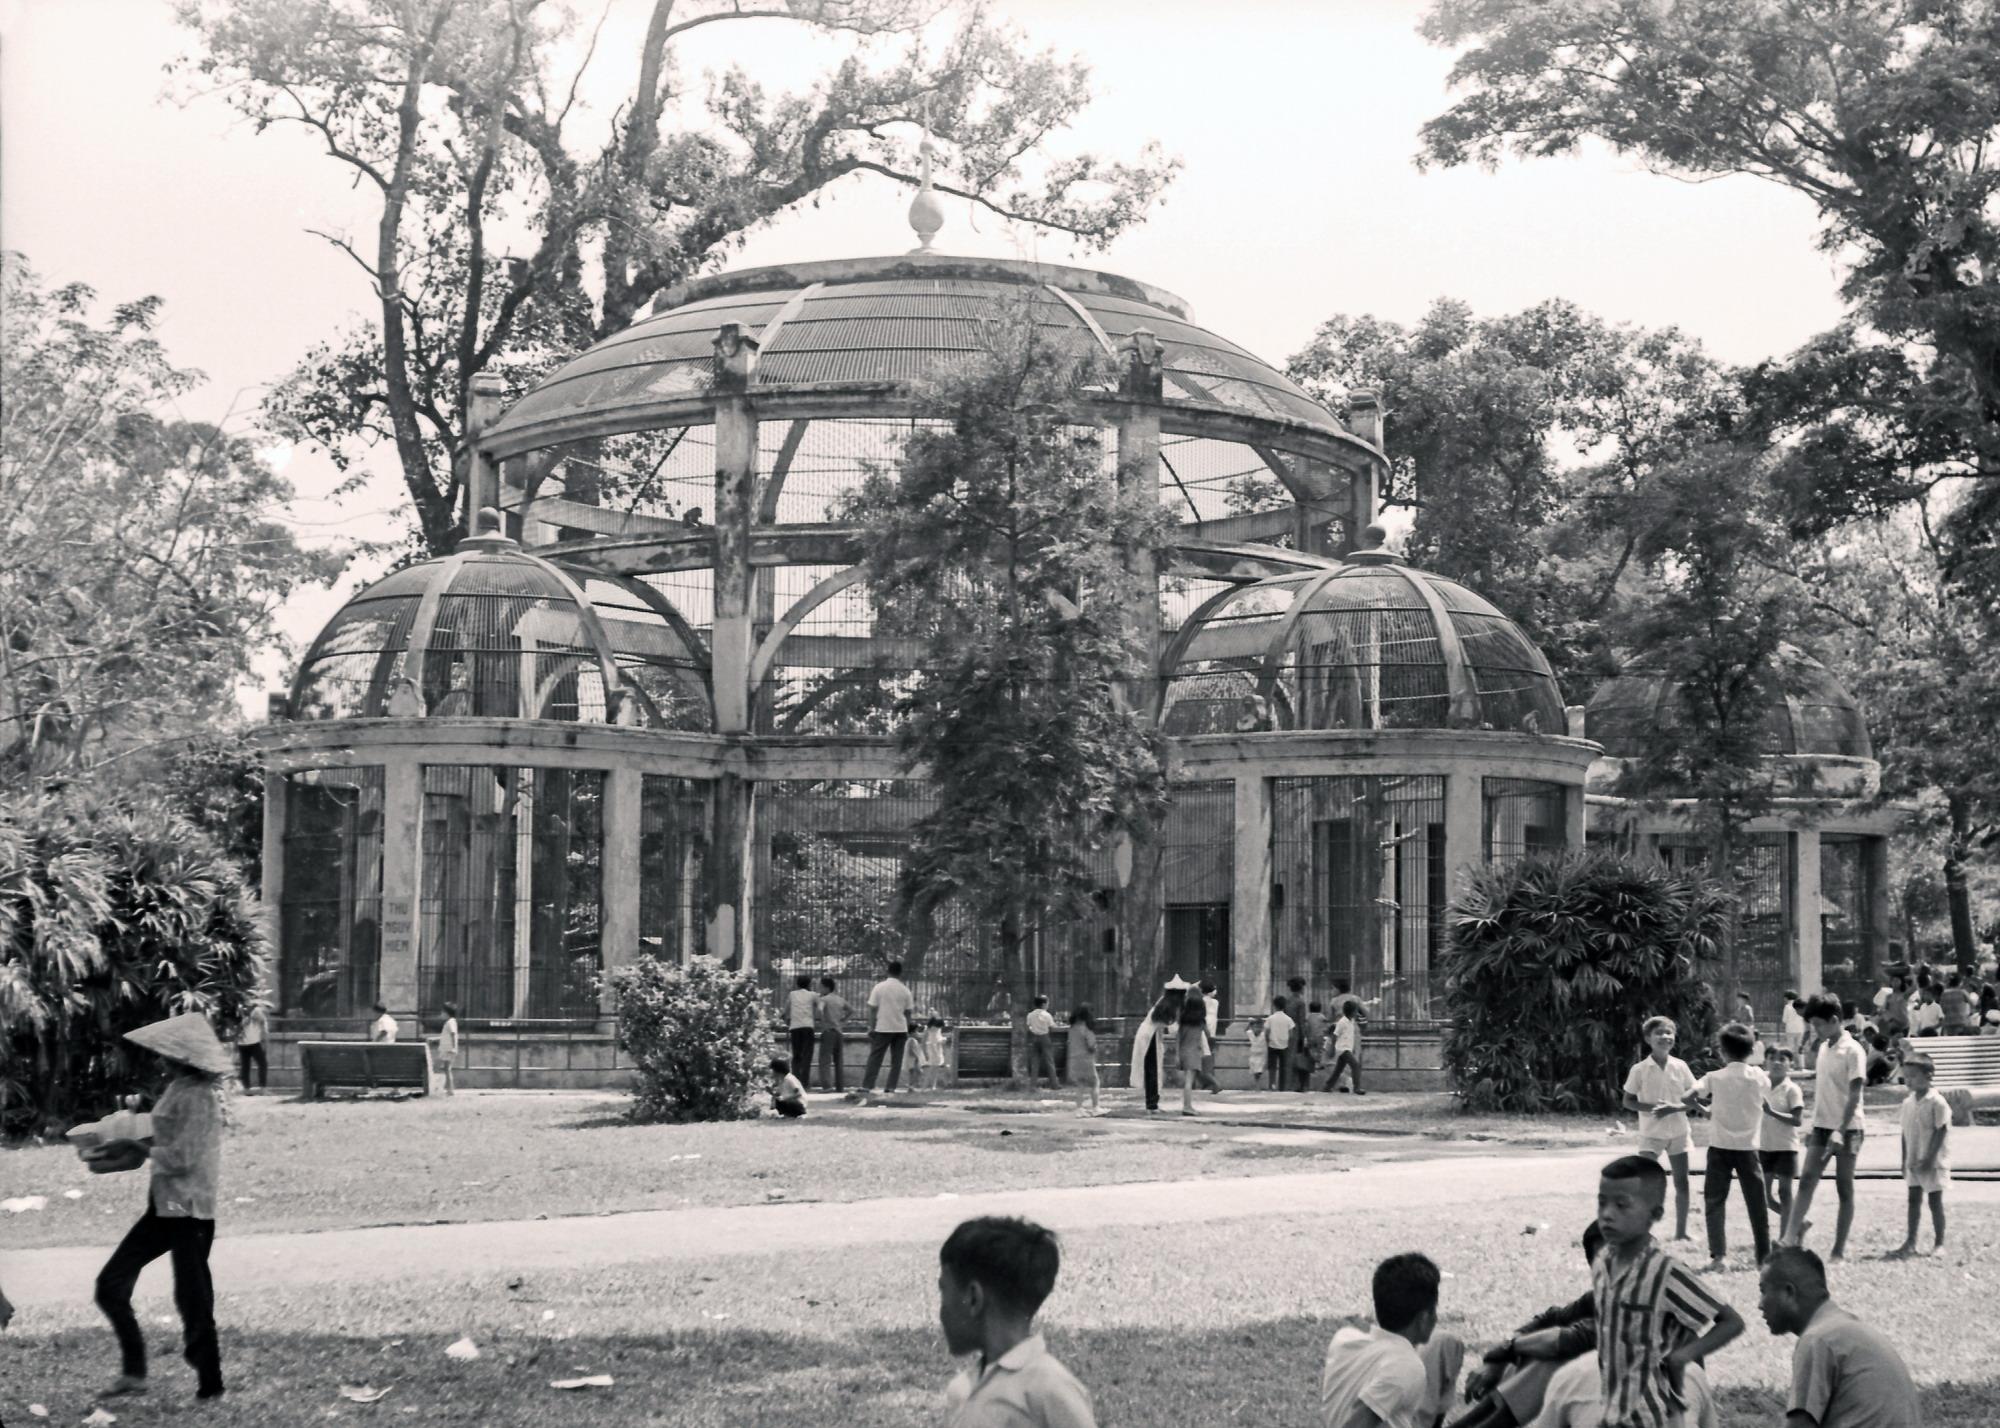 [Photos] The Saigon Zoo's enduring serenity in the 1970s